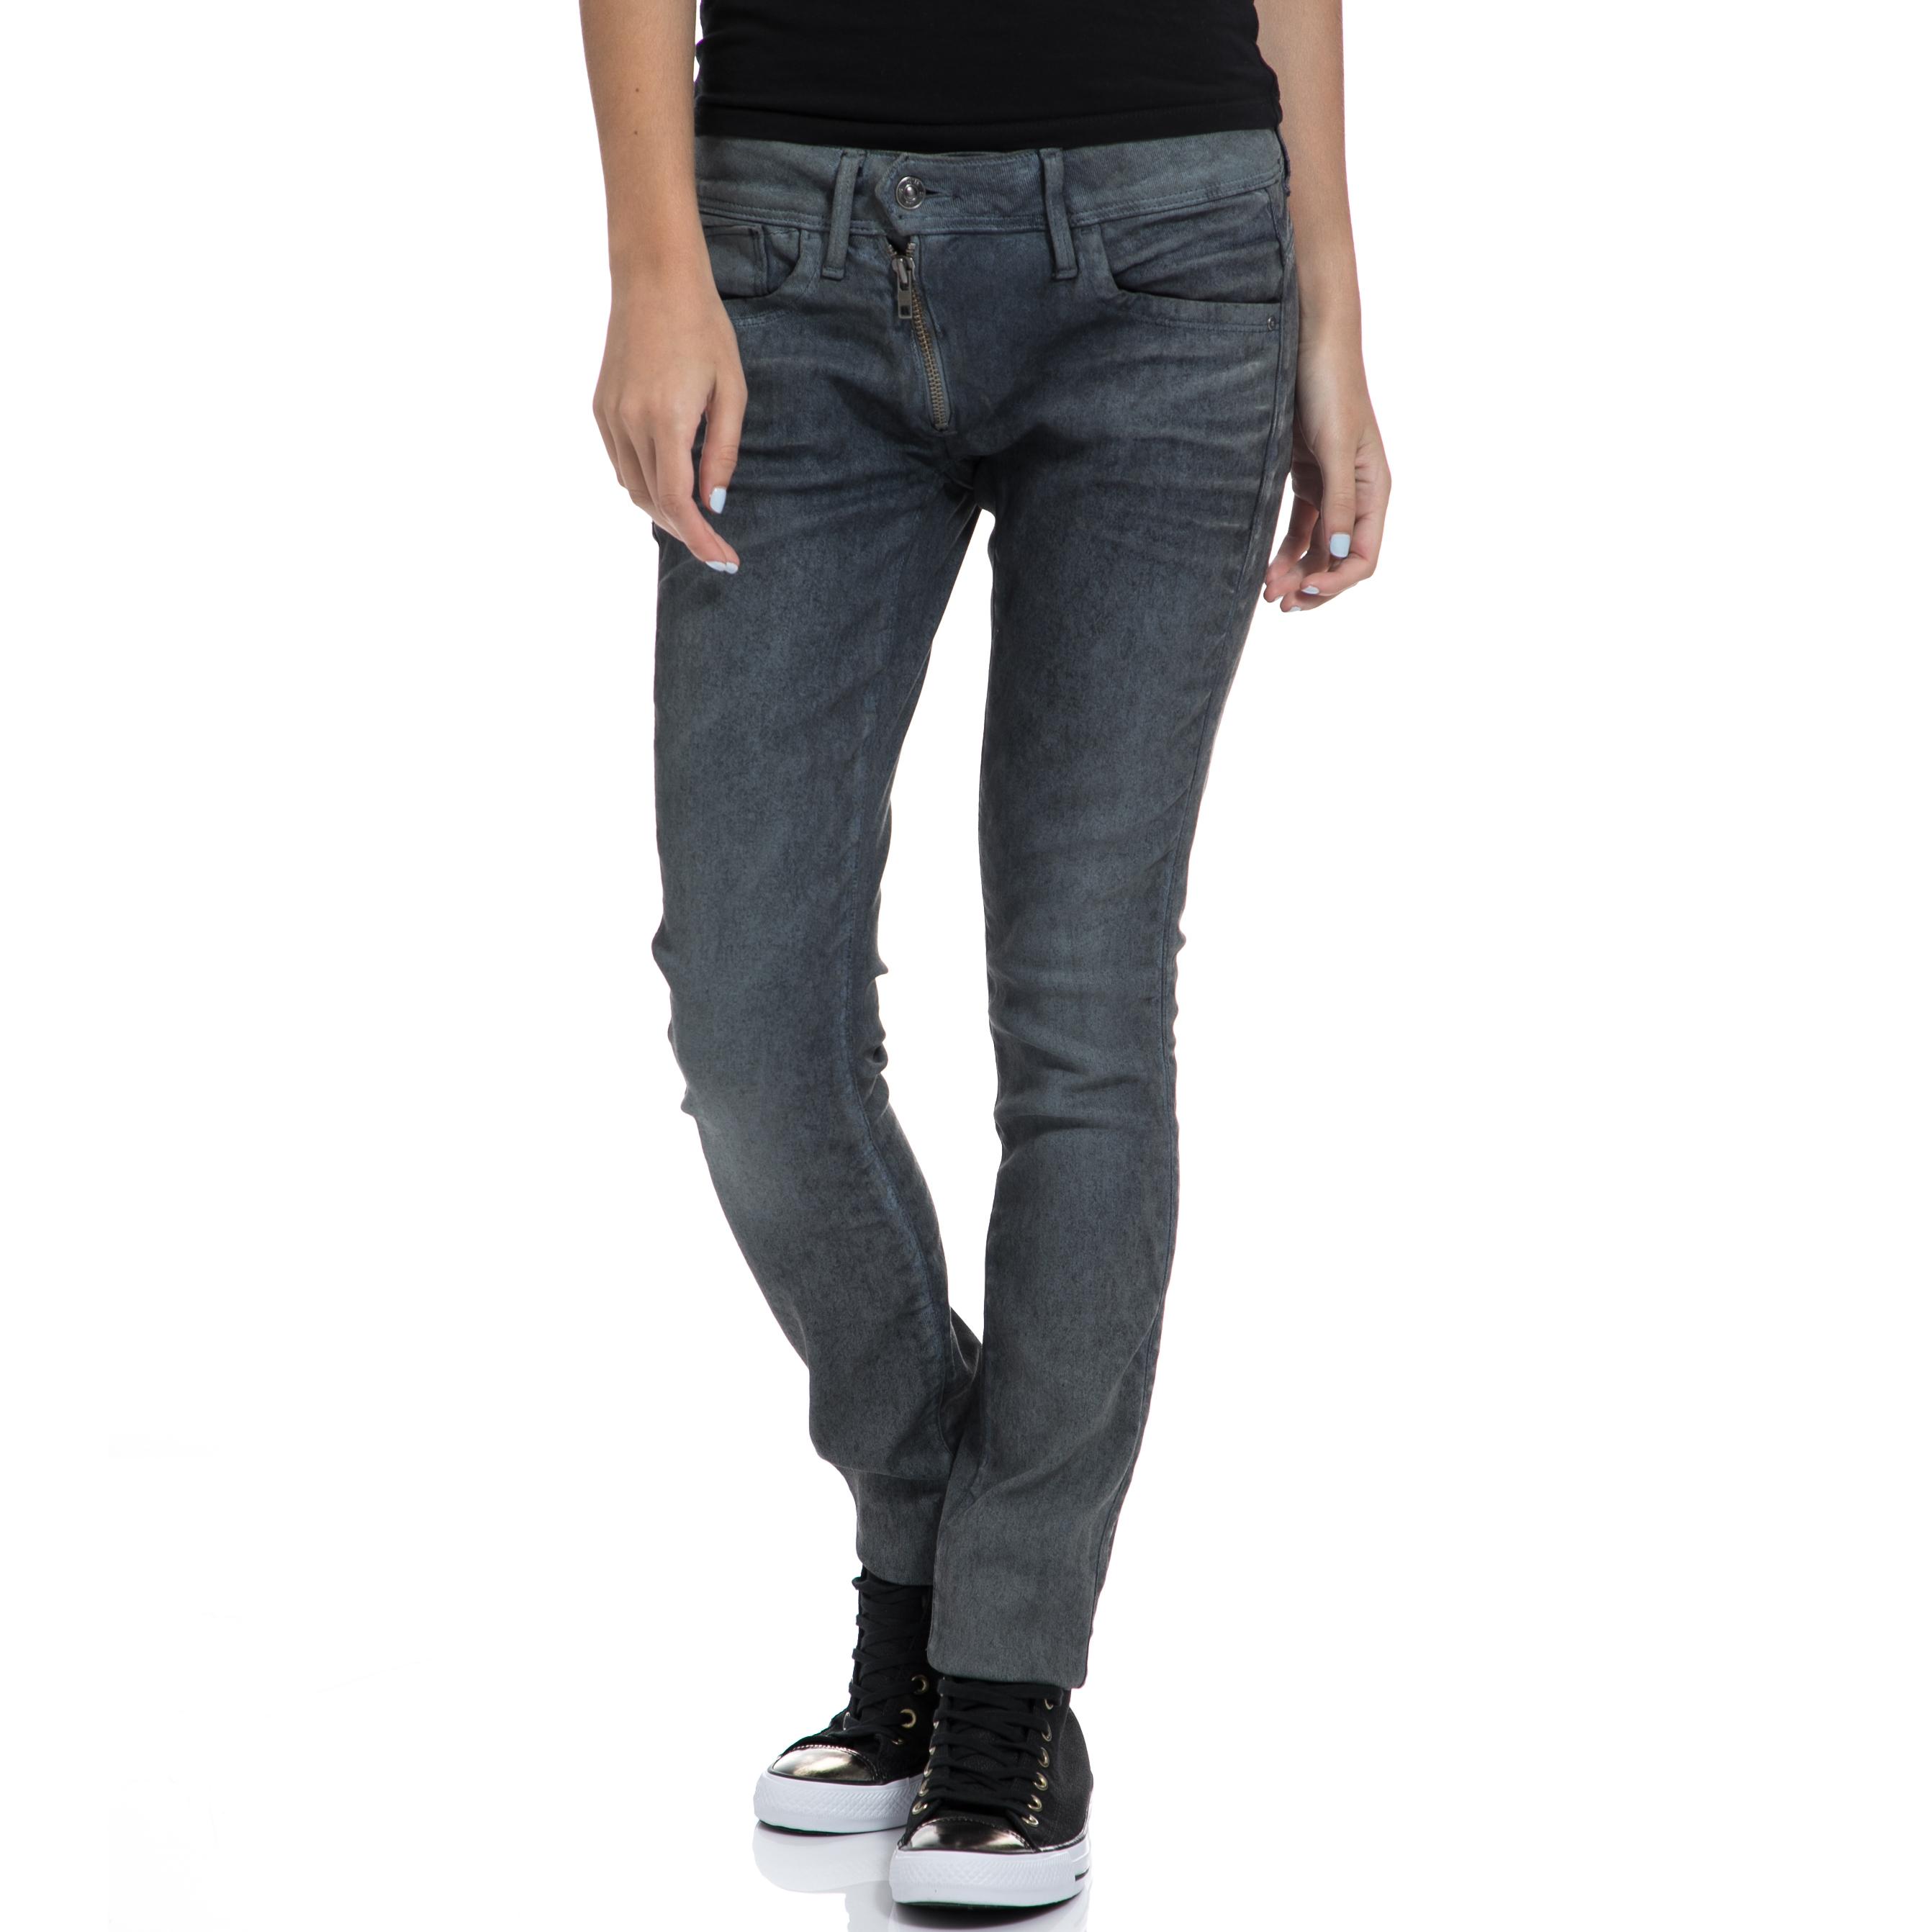 G-STAR RAW - Γυναικείο παντελόνι G-STAR RAW μπλε-γκρι γυναικεία ρούχα παντελόνια jean